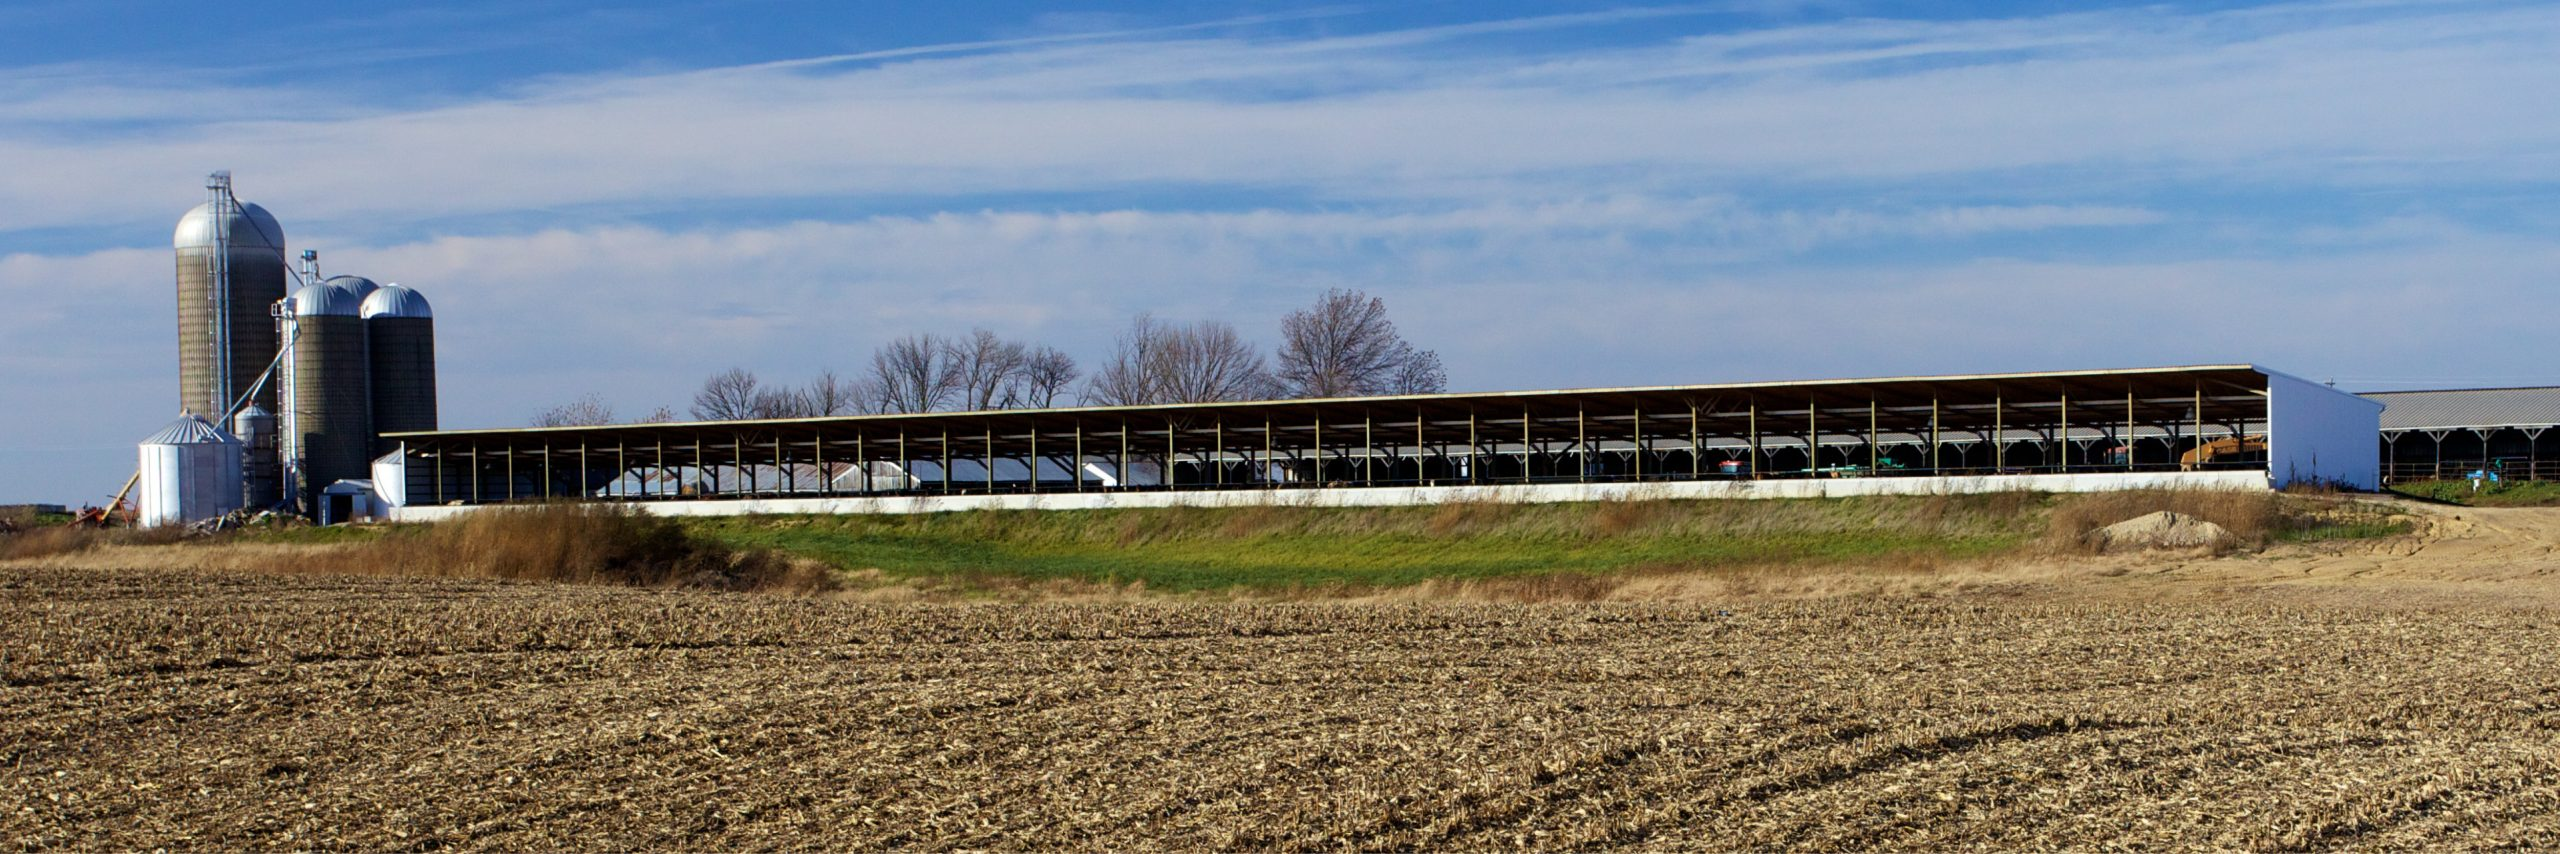 Irish farmers visit Illinois beef farm